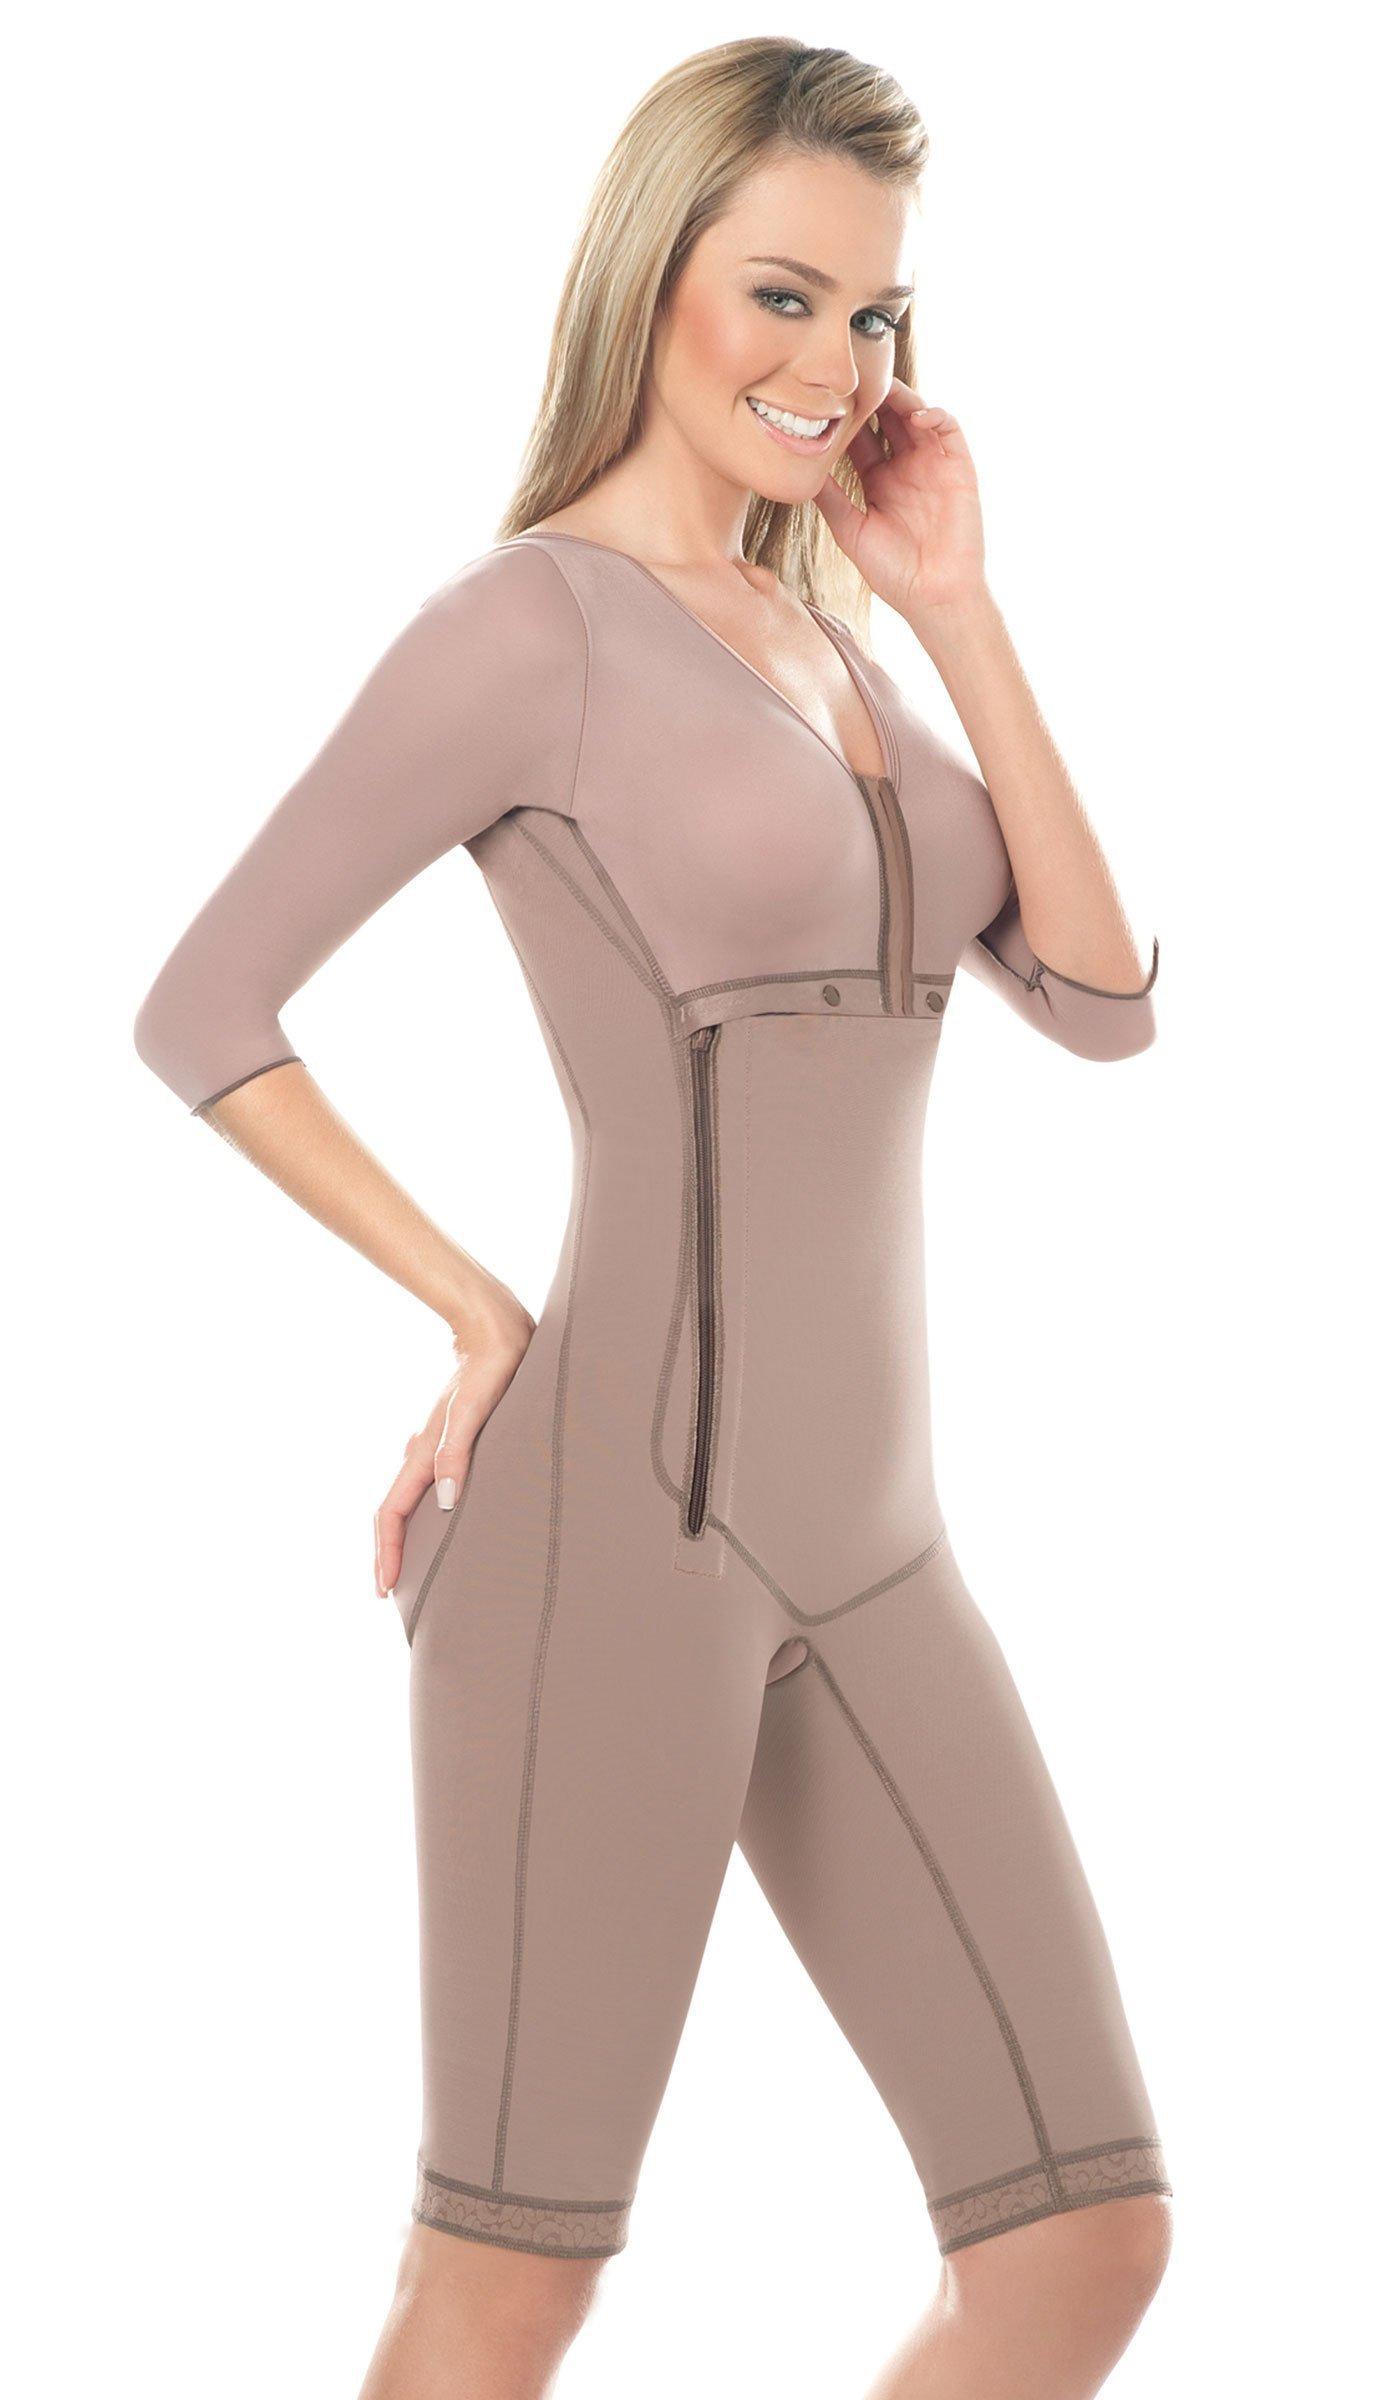 Fajas DPrada 008 Full Body Shaper Liposuction Compression Garments Post Surgery - Cocoa-Optic - 3XL